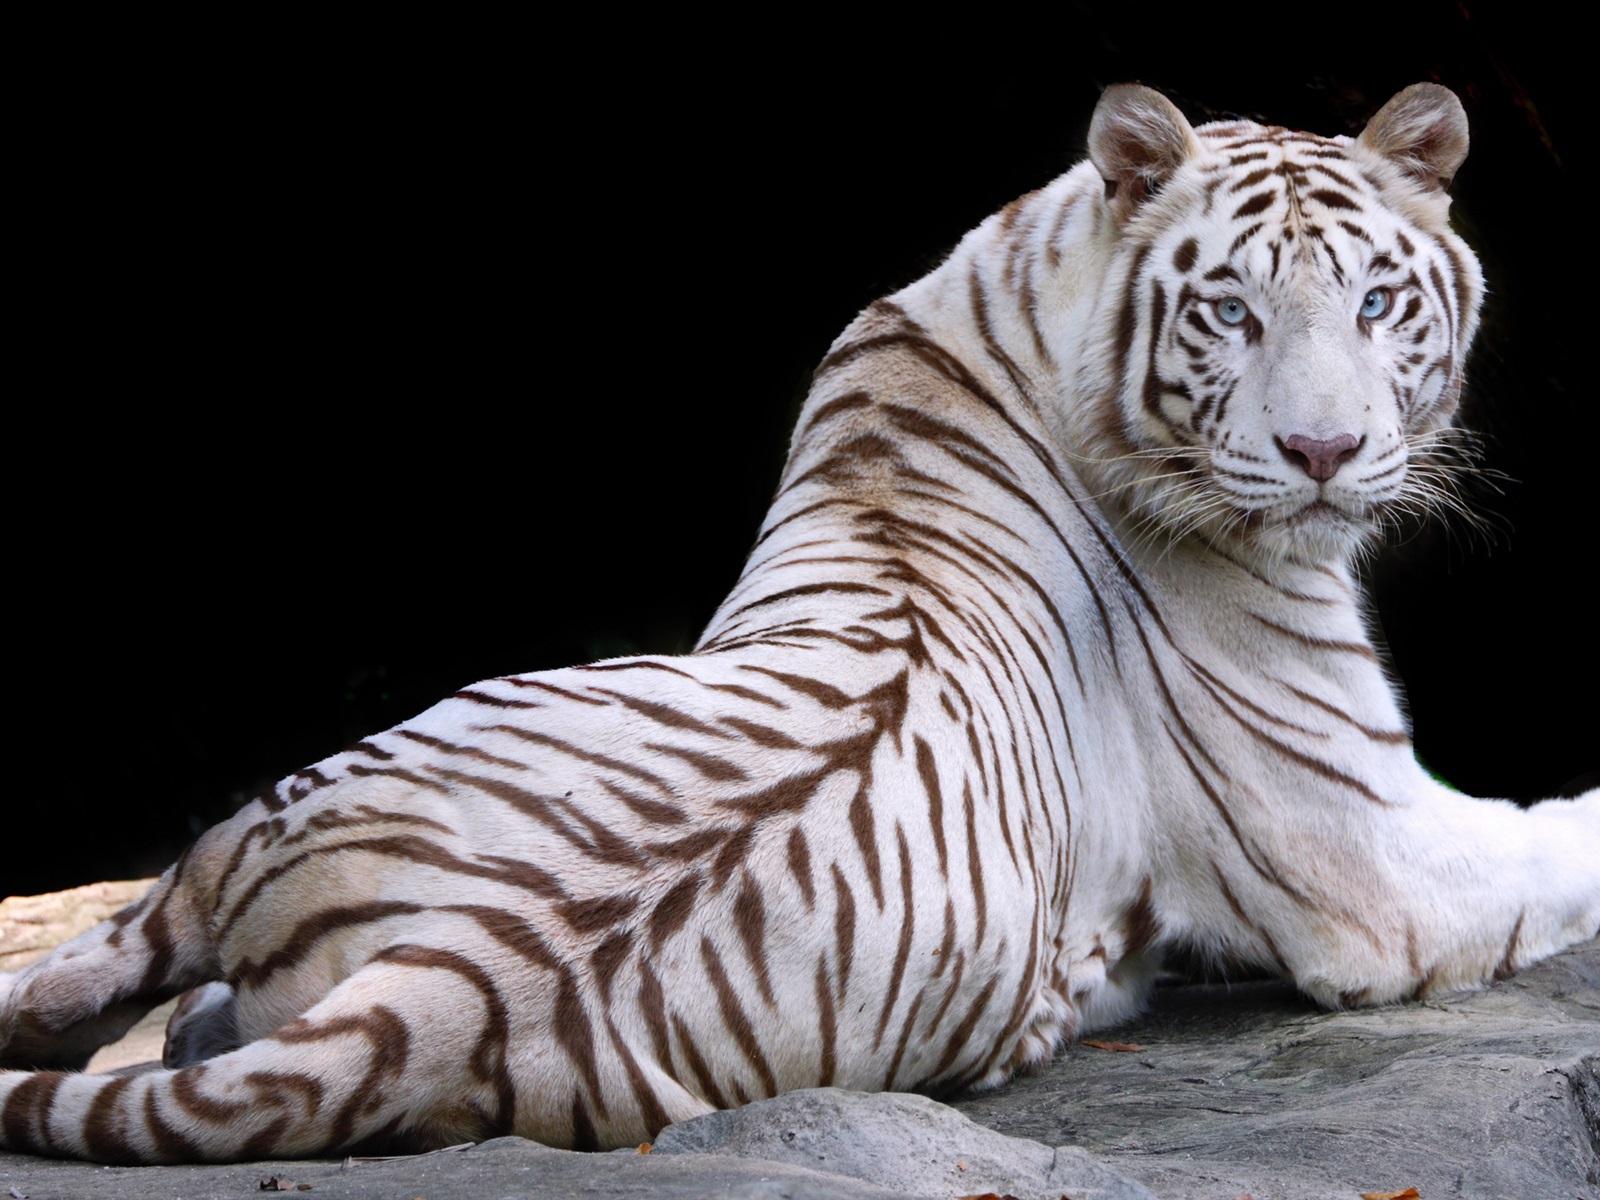 Papeis De Parede Tigre Branco Olhe Para Tras Descanse Olhos